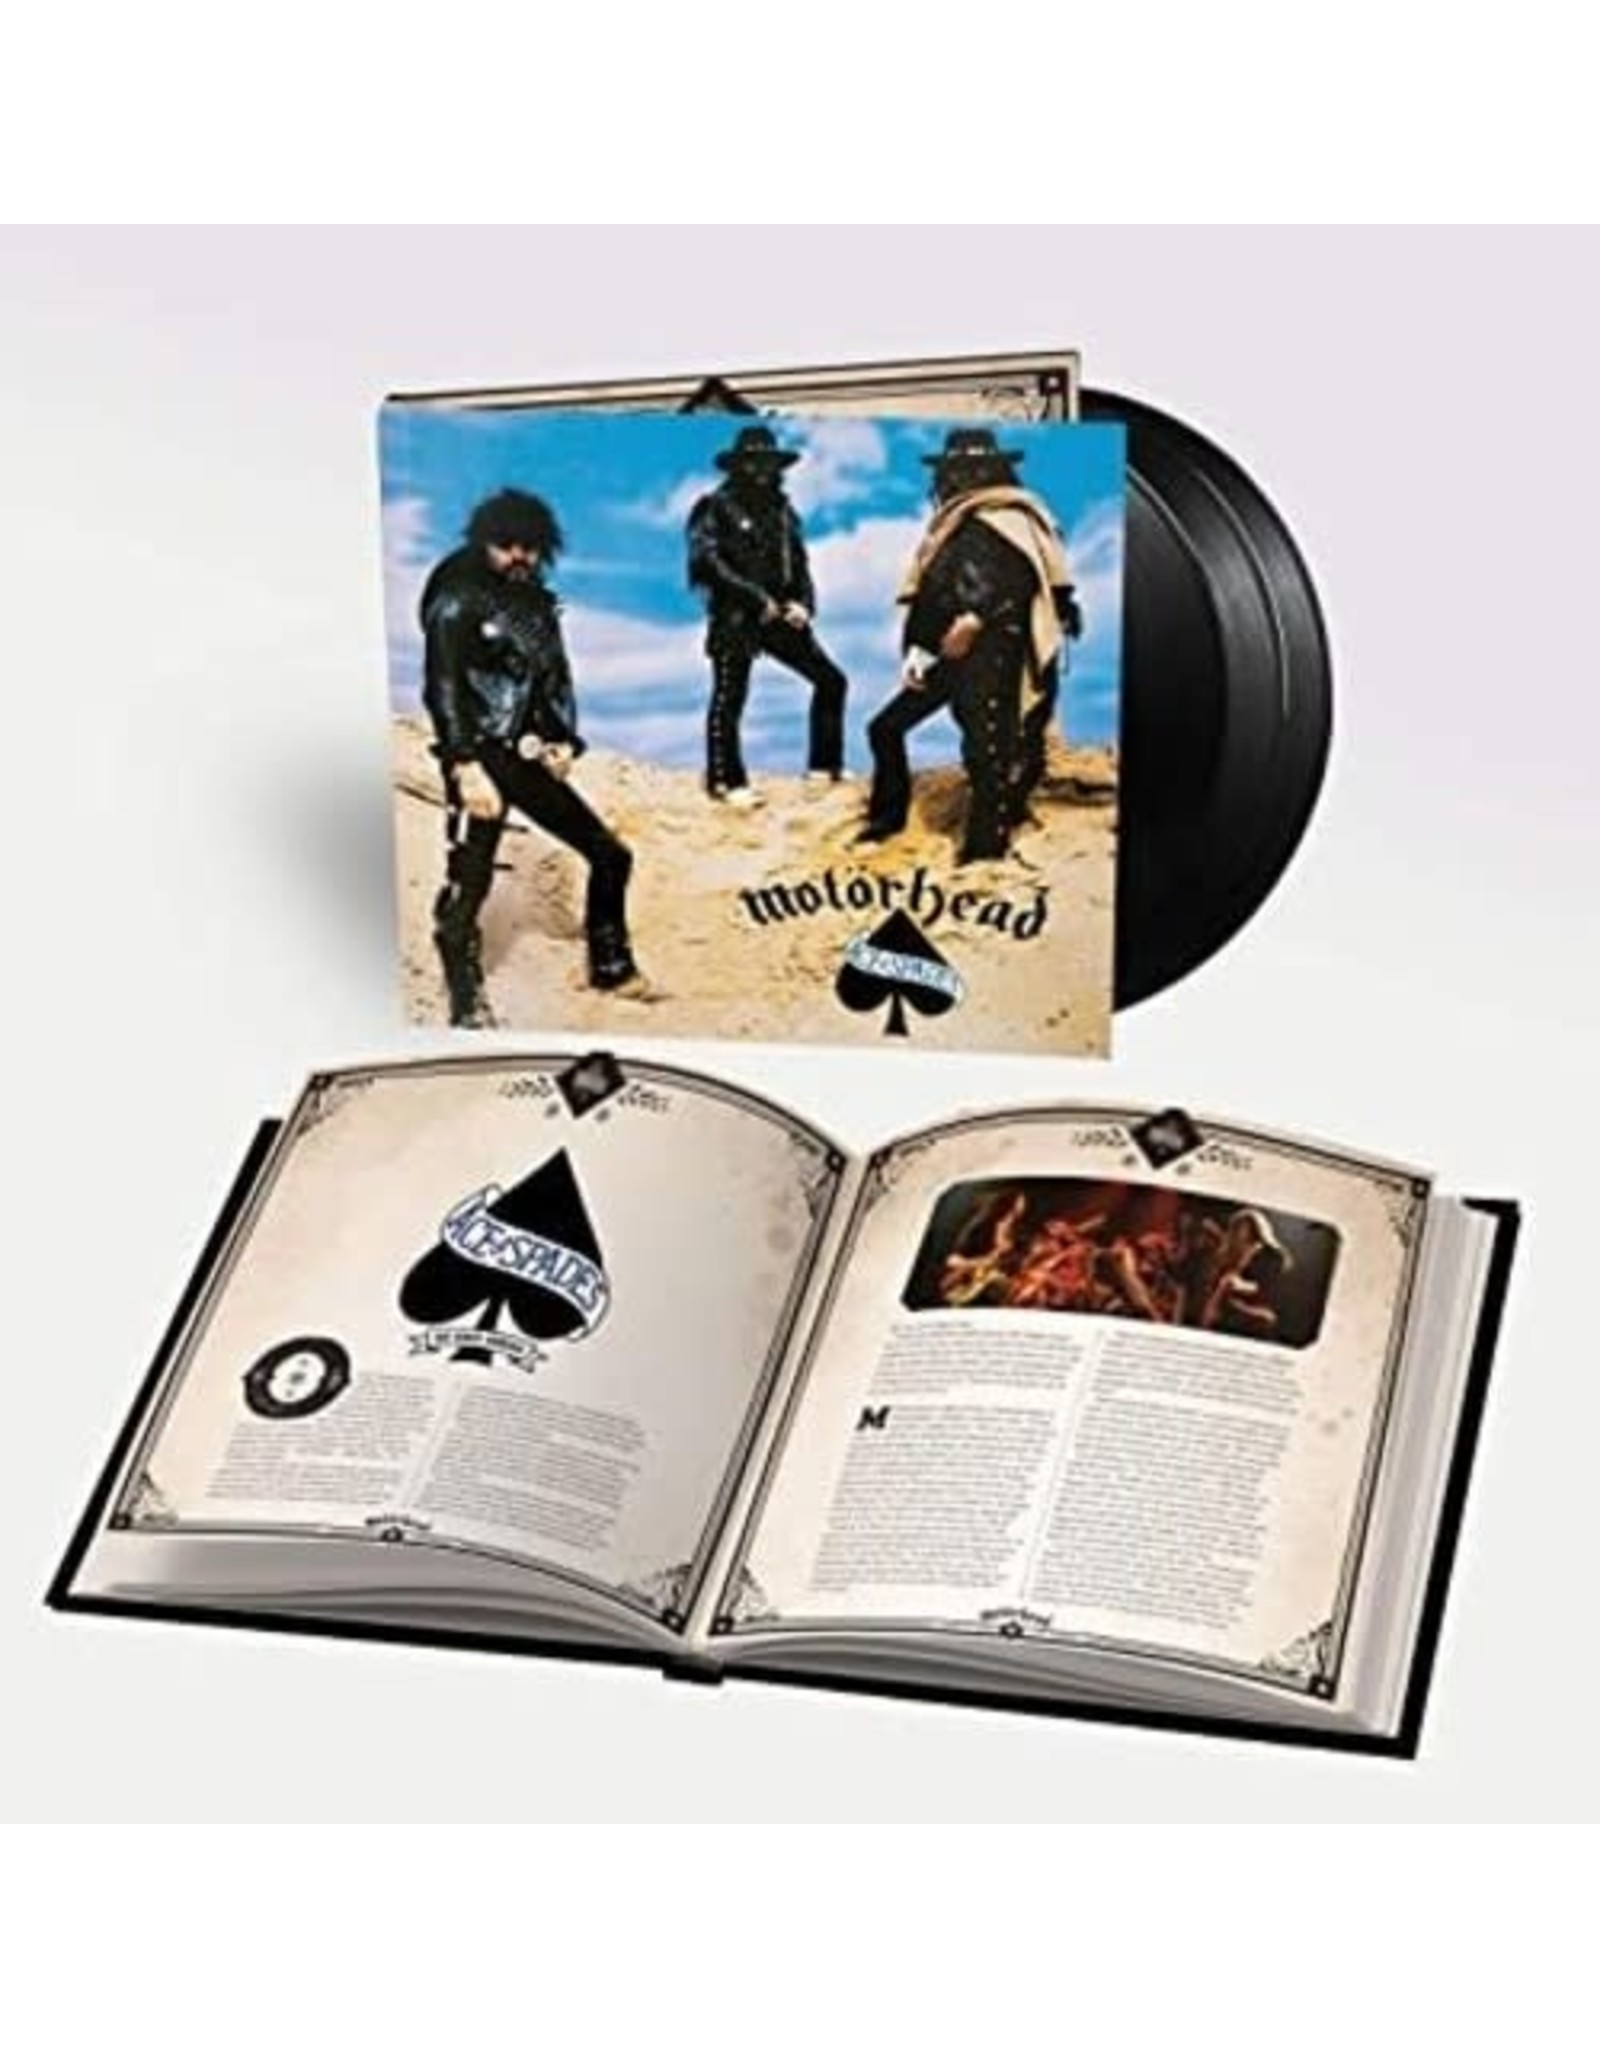 New Vinyl Motorhead - Ace Of Spades 3LP+Book